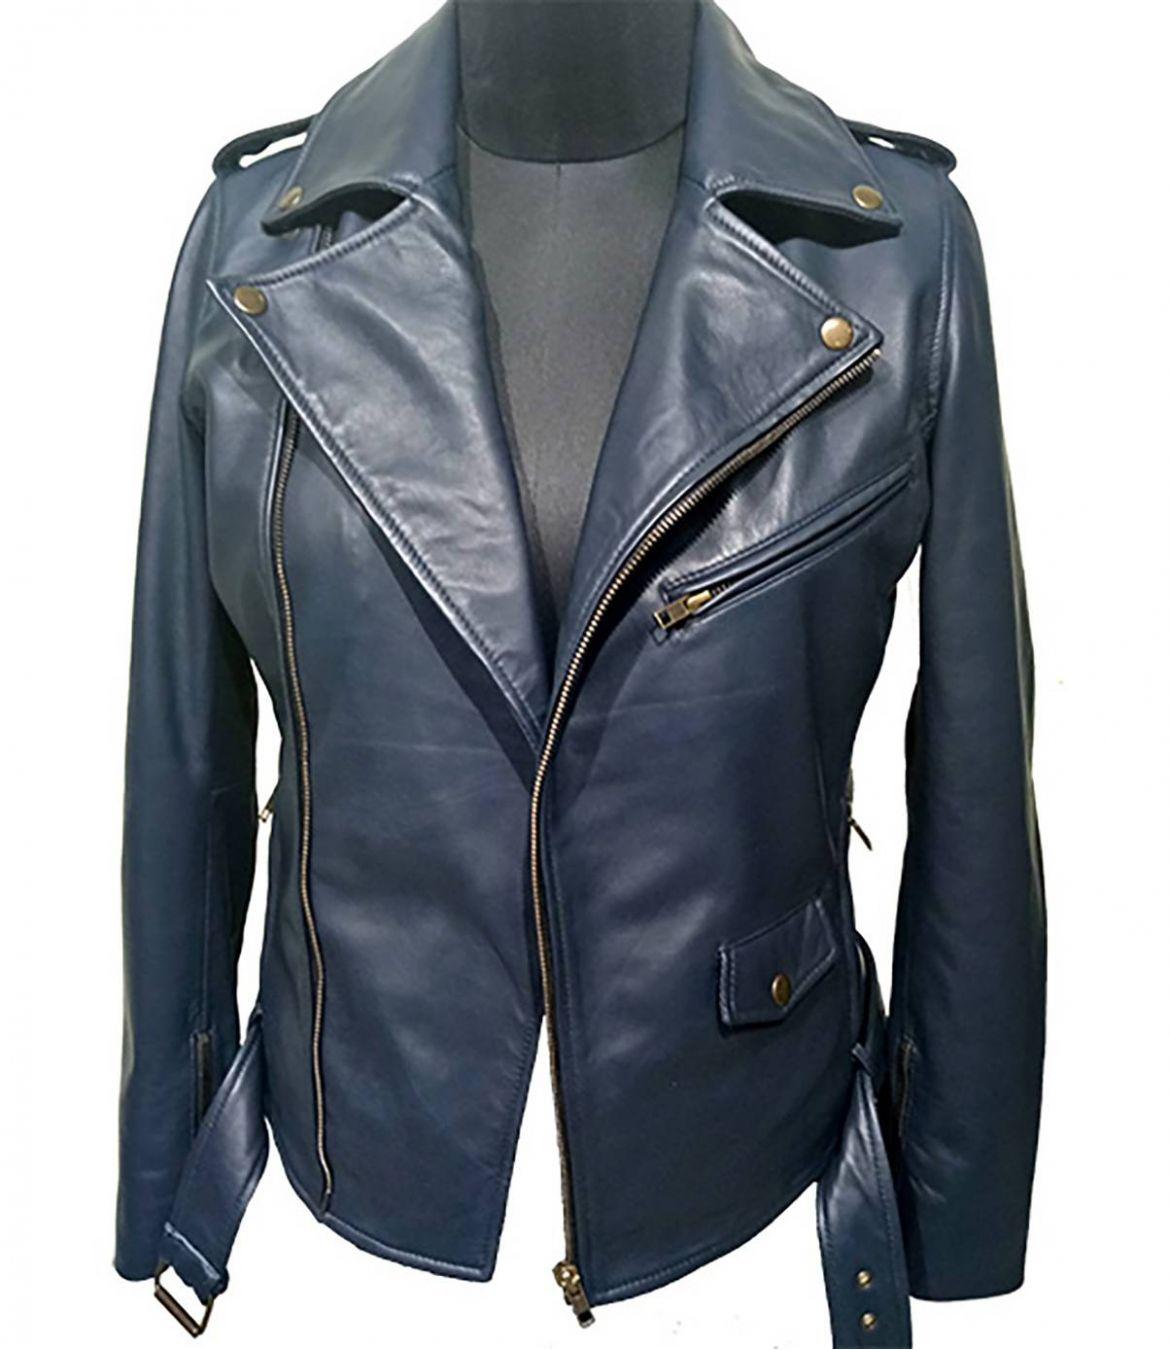 PERFECTO Women's Leather Jacket Storiatipic - 1